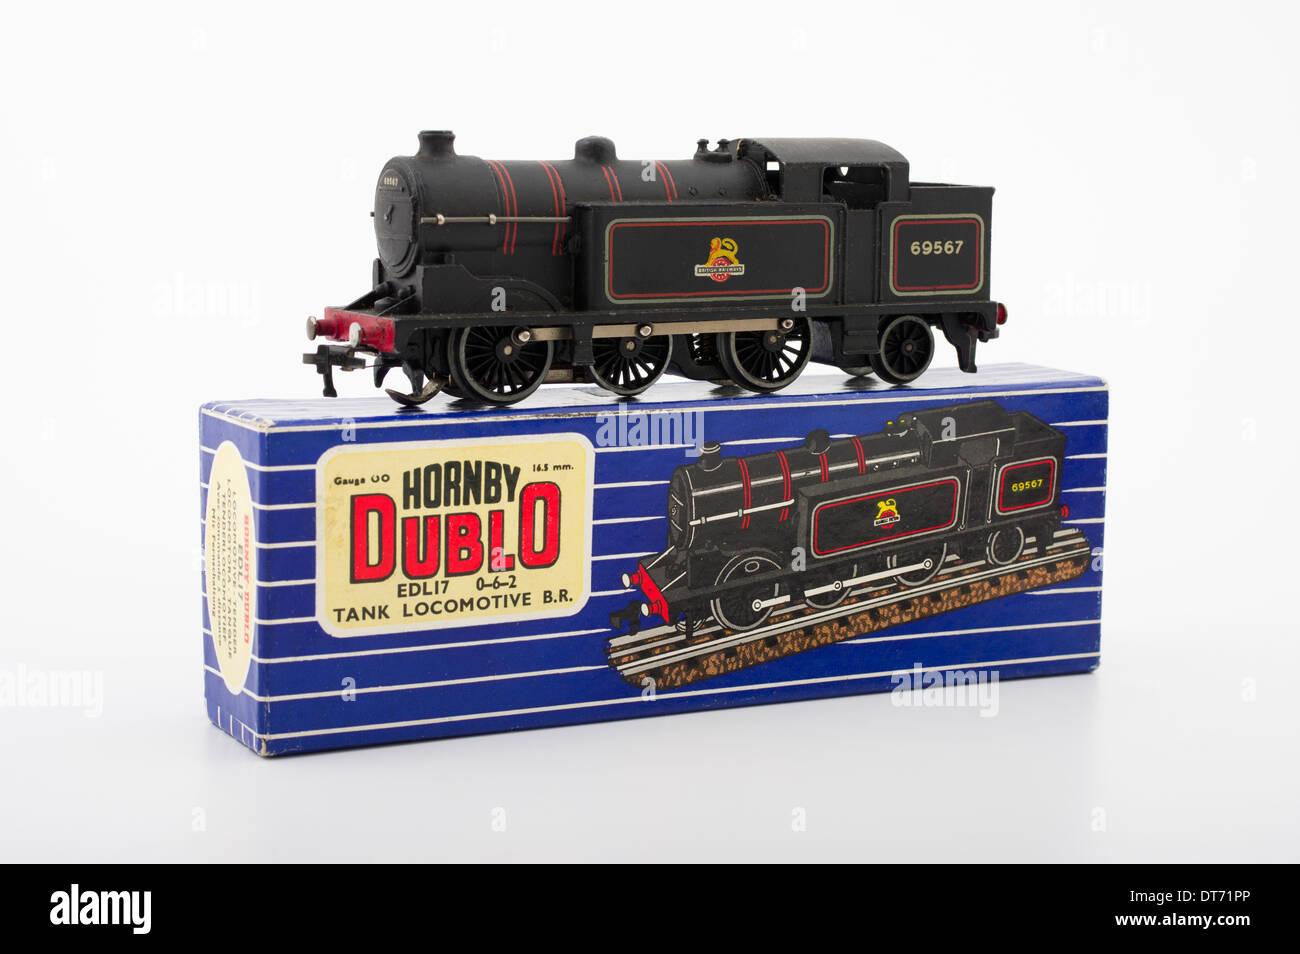 Hornby Dublo EDL17 Tank Locomotive Train Classic Brtish Children's Toy - Stock Image